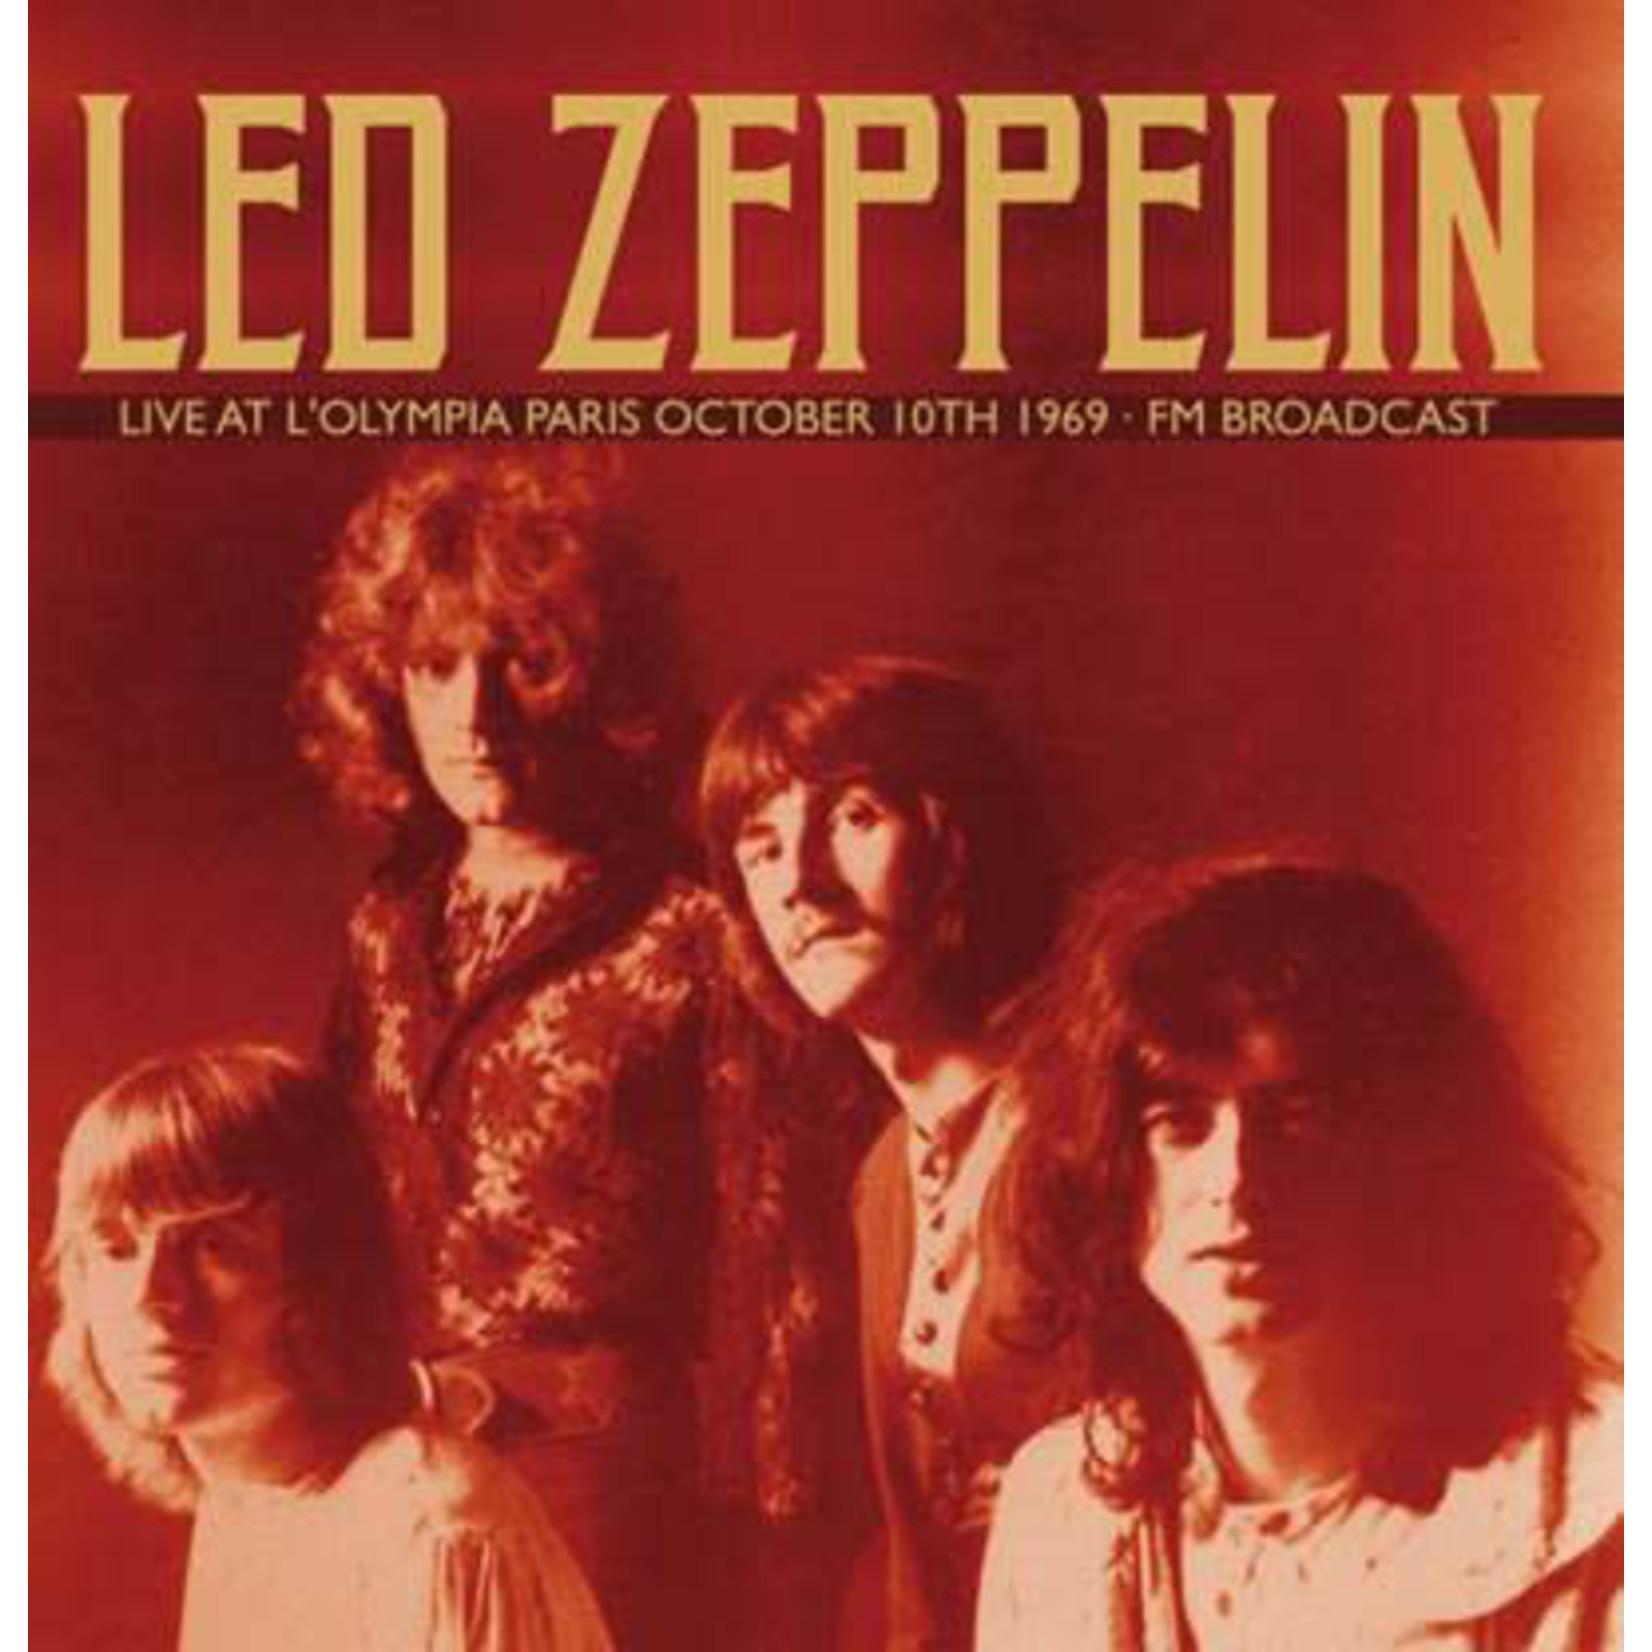 LED ZEPPELIN LIVE AT L'OLYMPIA PARIS OCTOBER 10TH 1969 (2LP) FM BROADCAST